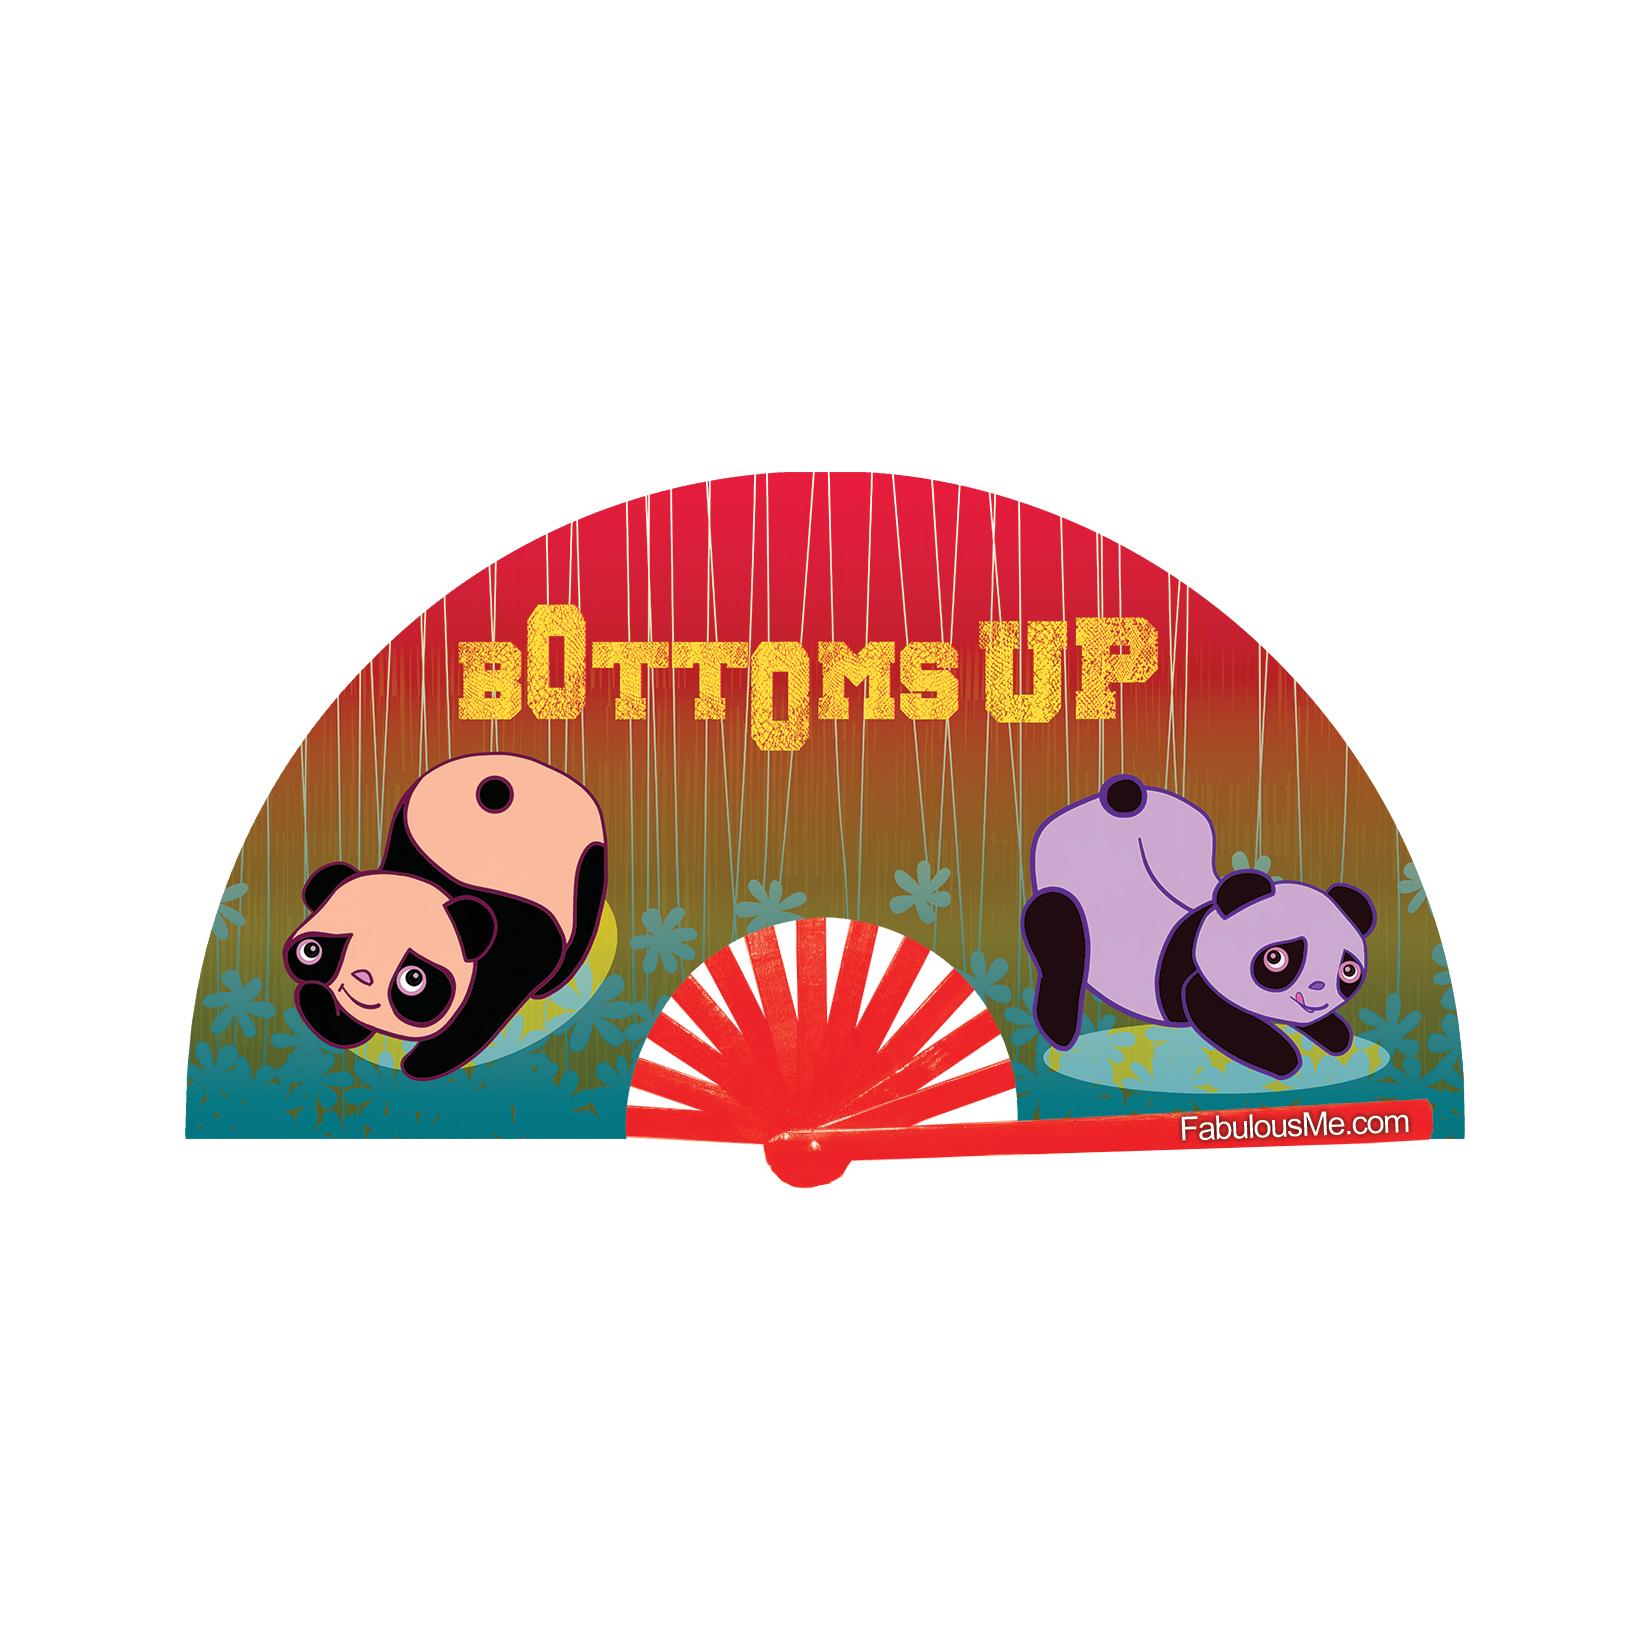 JJMalibu Plur Panda Bottoms Up v2 Fan (UV Glow)